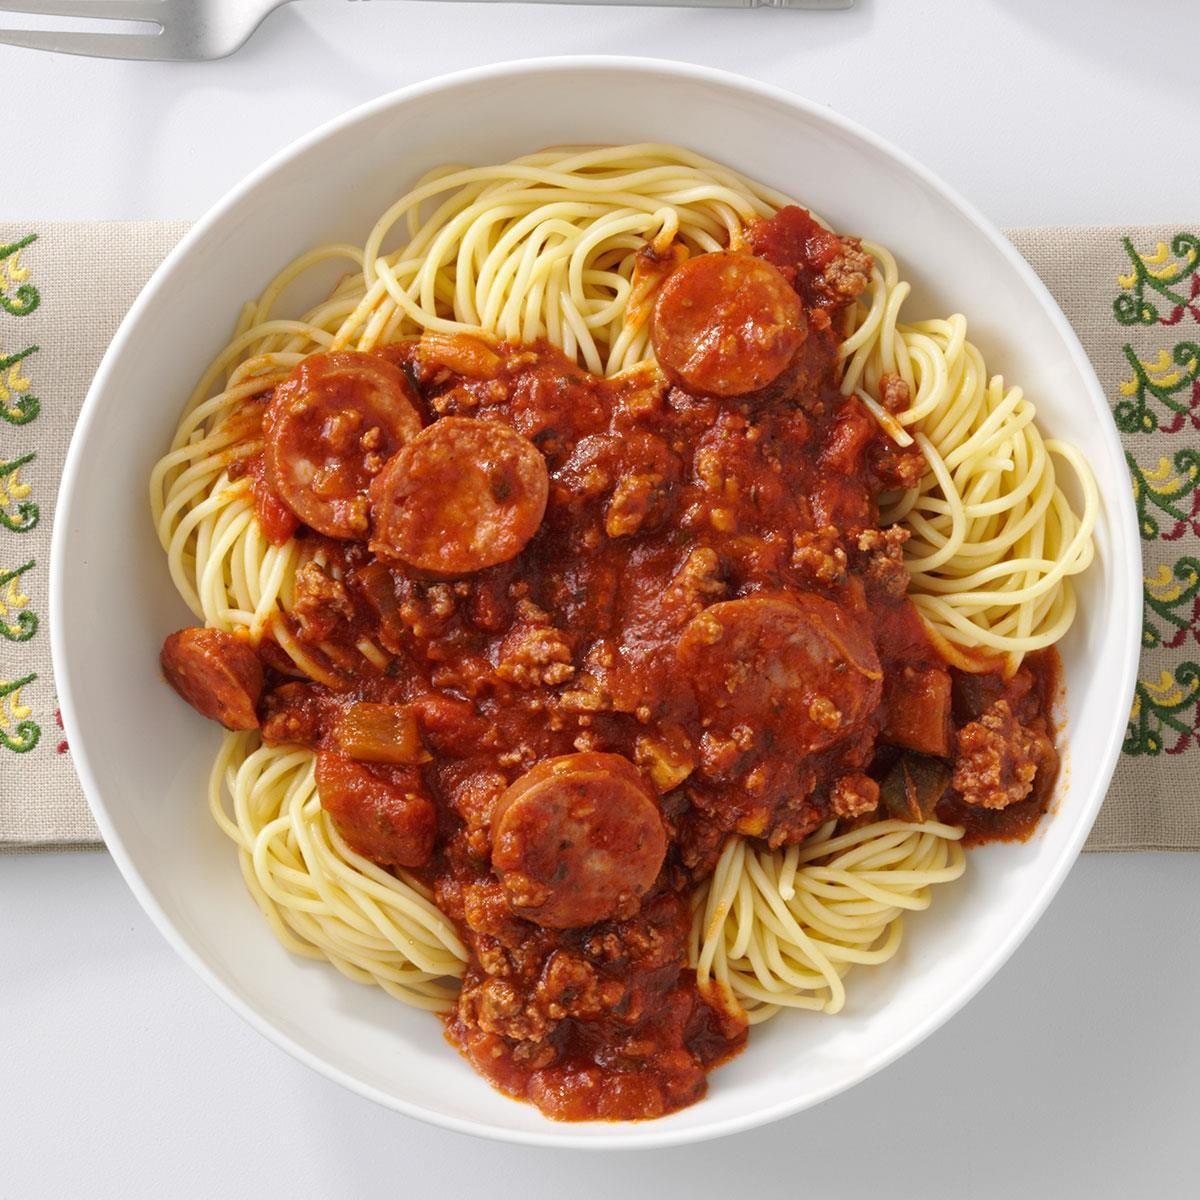 Super Spaghetti Sauce Recipe Dinner With Ground Beef Beef Dinner Beef Recipes For Dinner